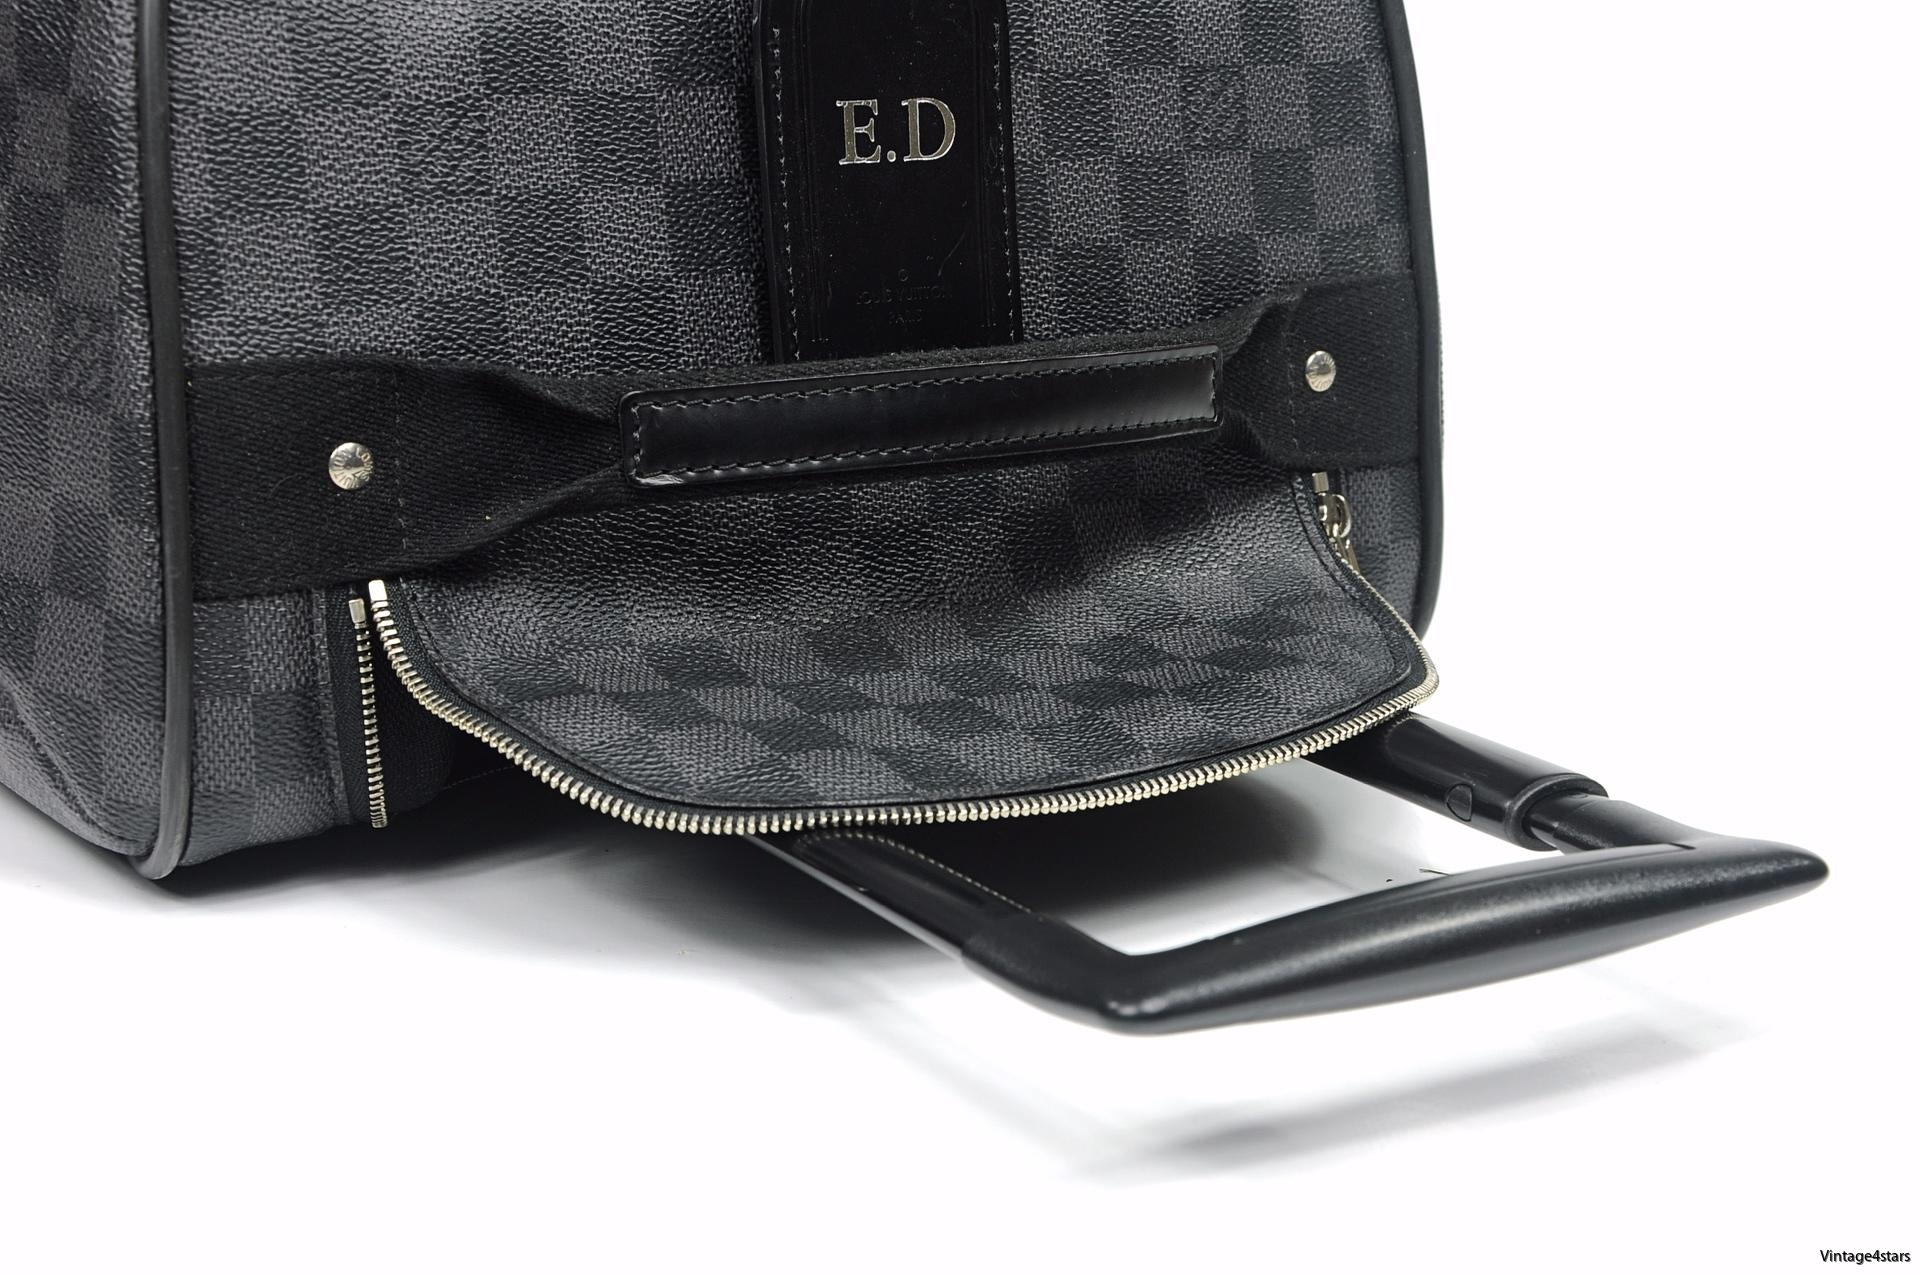 Louis Vuitton Eole 55 NEO Graphite 4